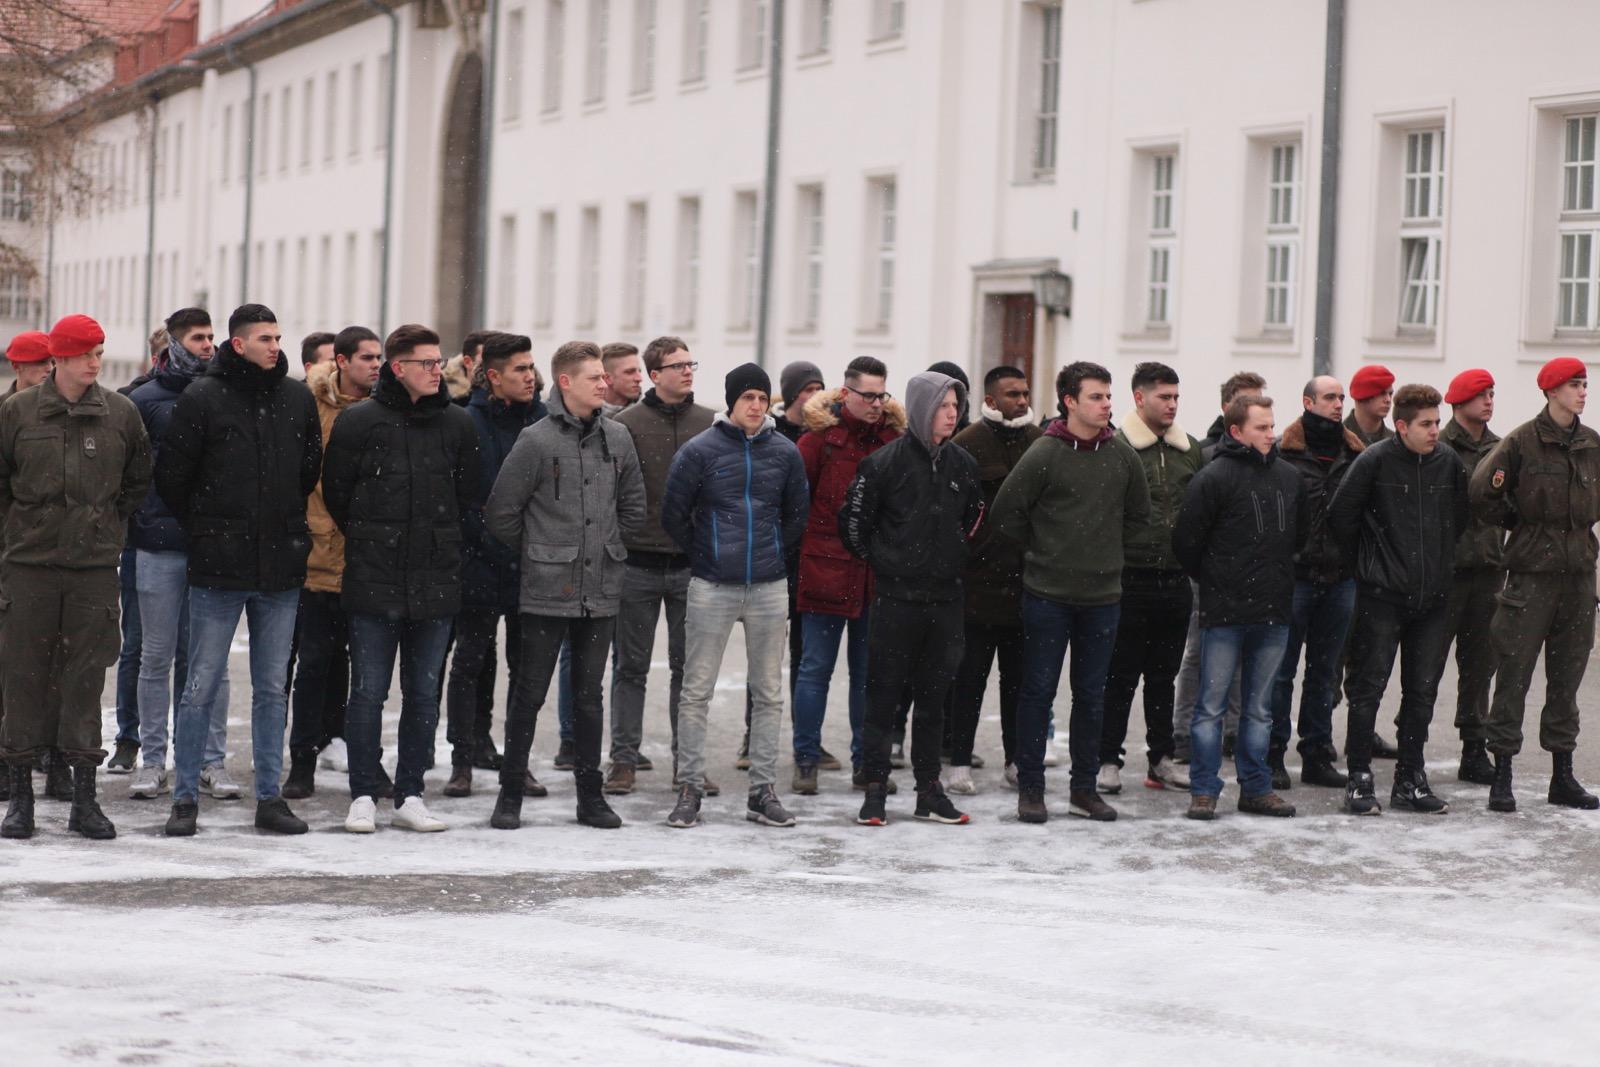 2019_01_03_3Gardekompanie_Verabschiedung - 13 of 15